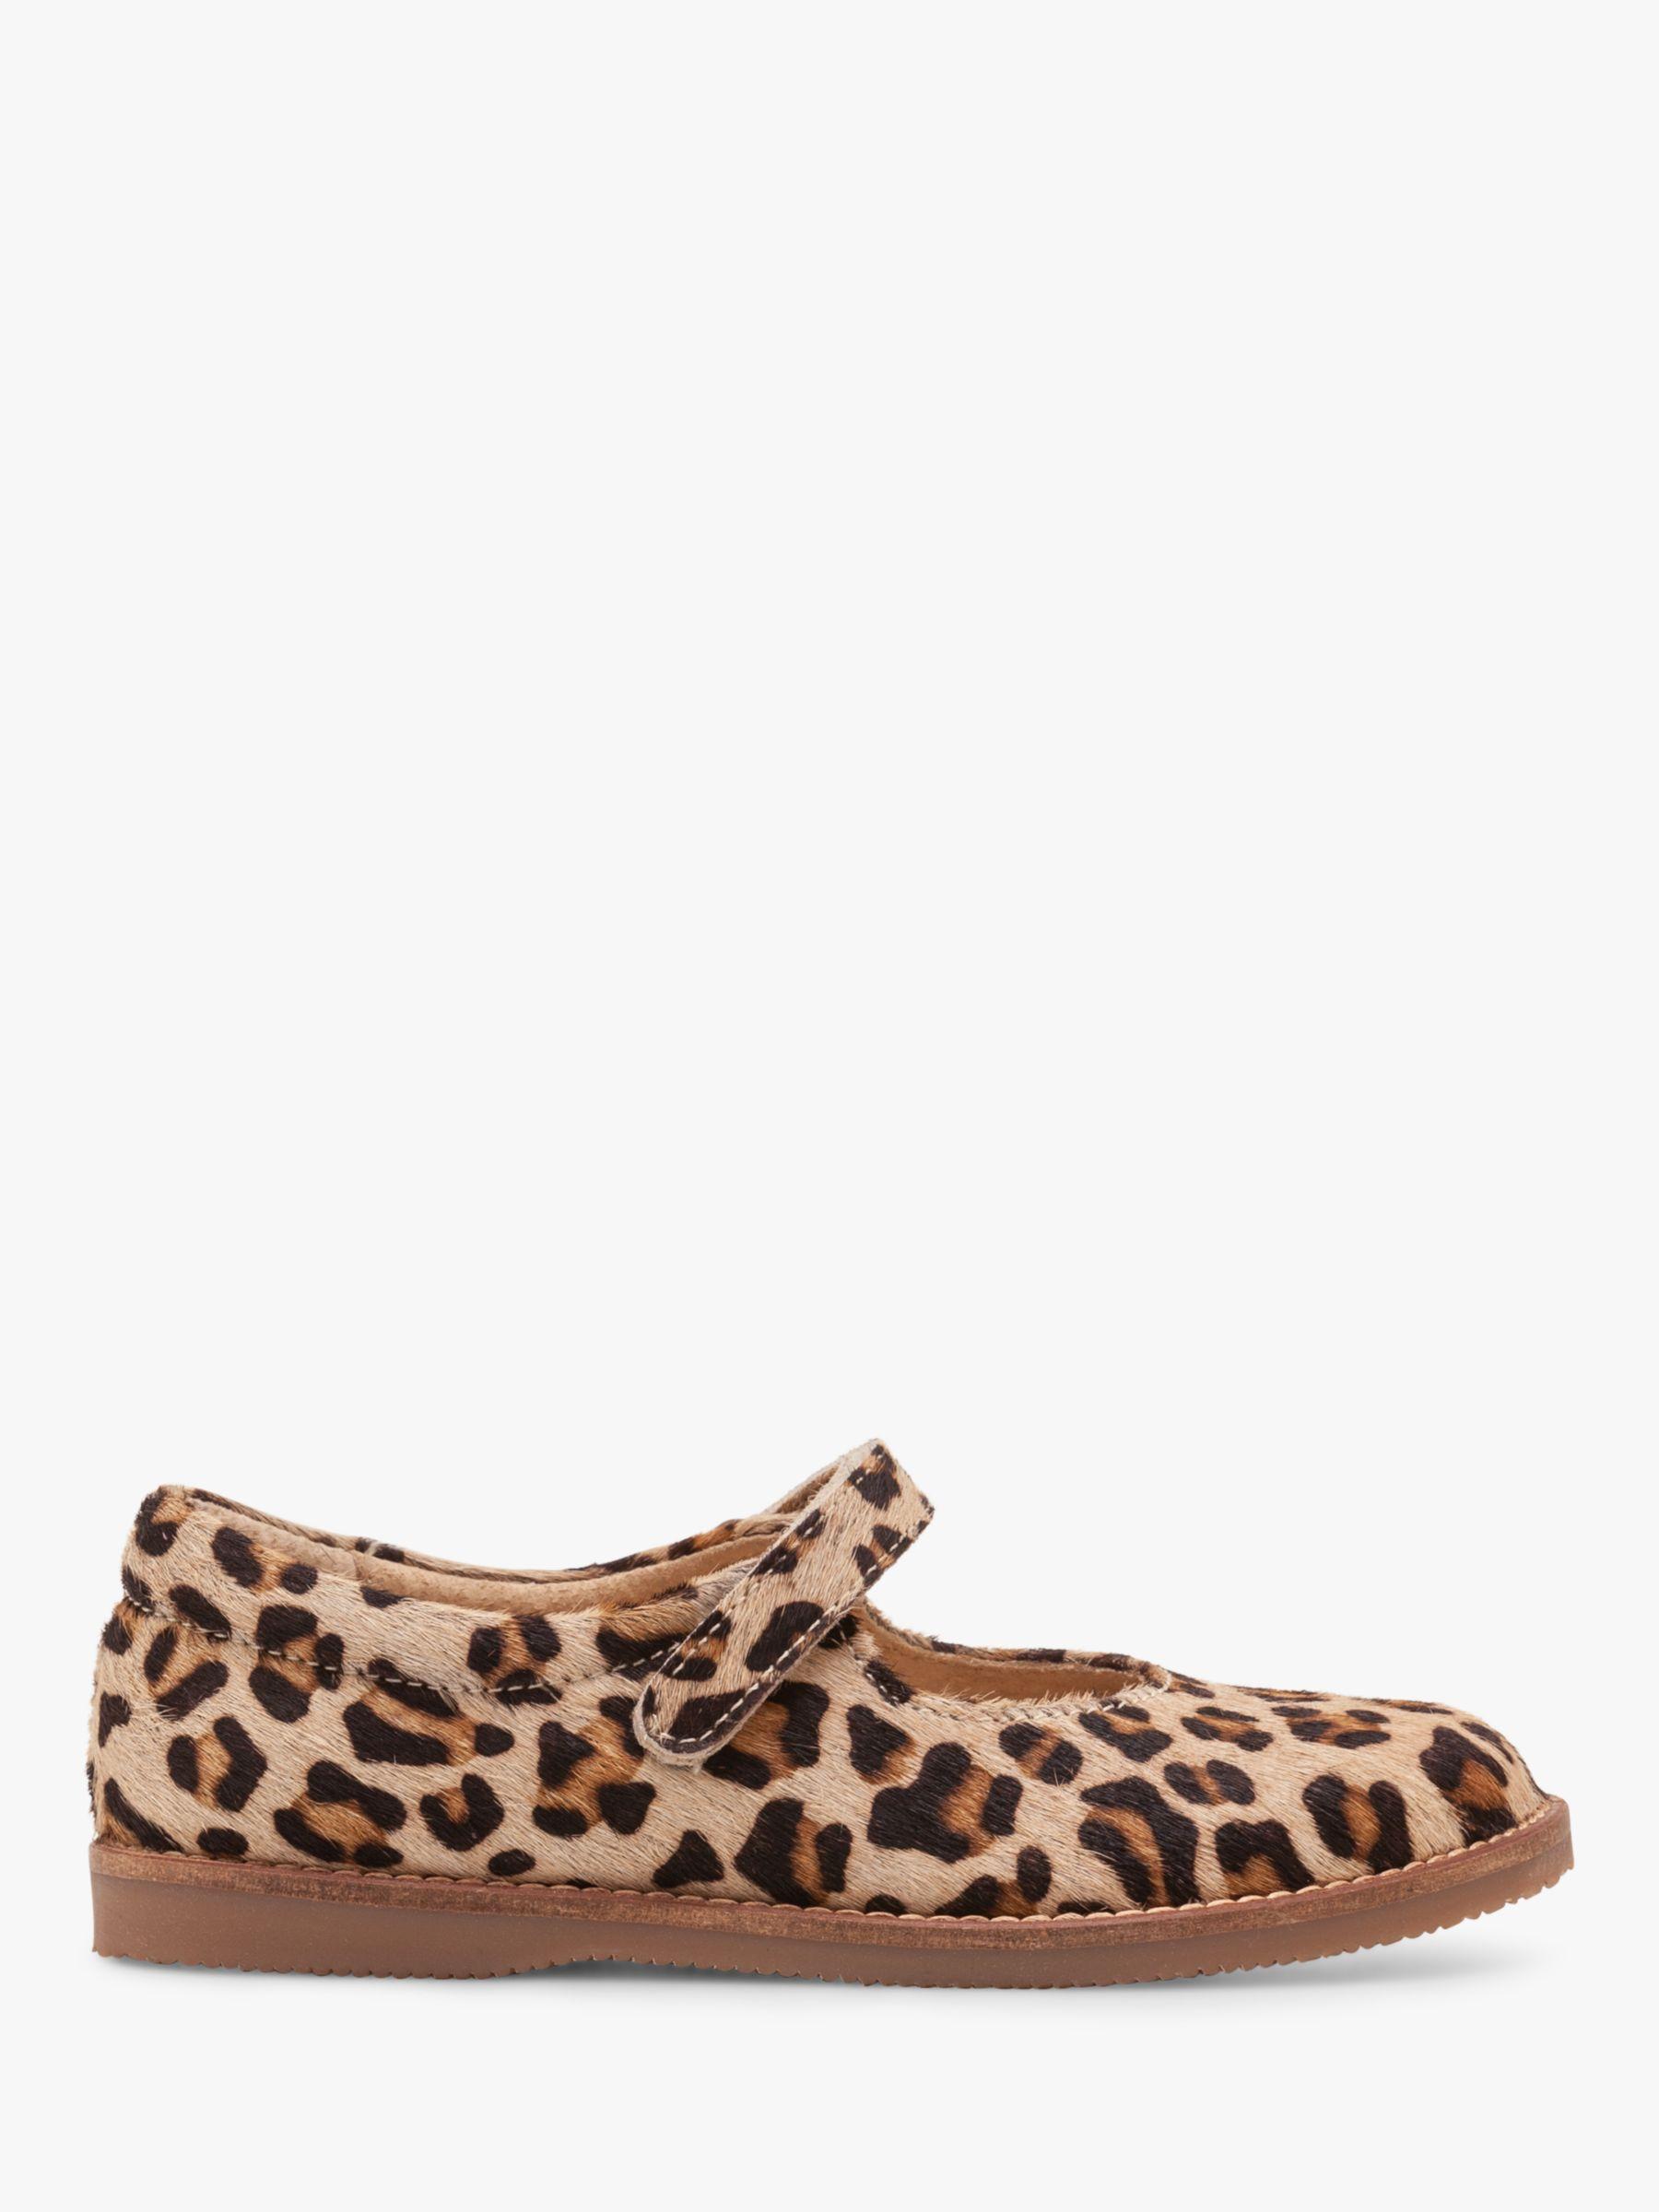 Mini Boden Mini Boden Leather Leopard Print Mary Jane Shoes, Tan